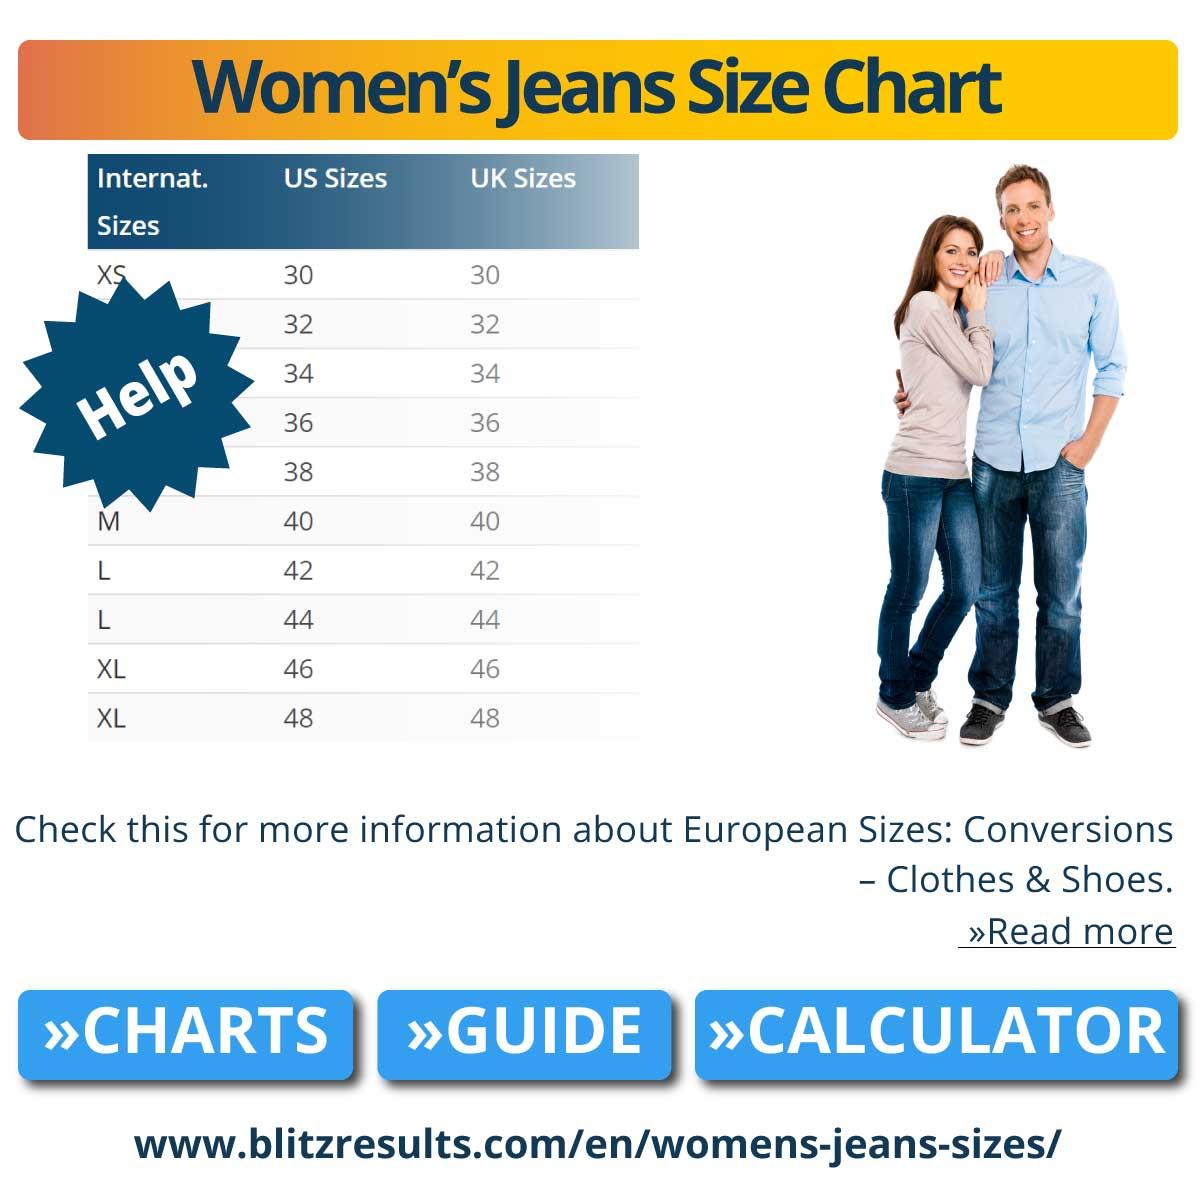 Women's Jeans Size Chart